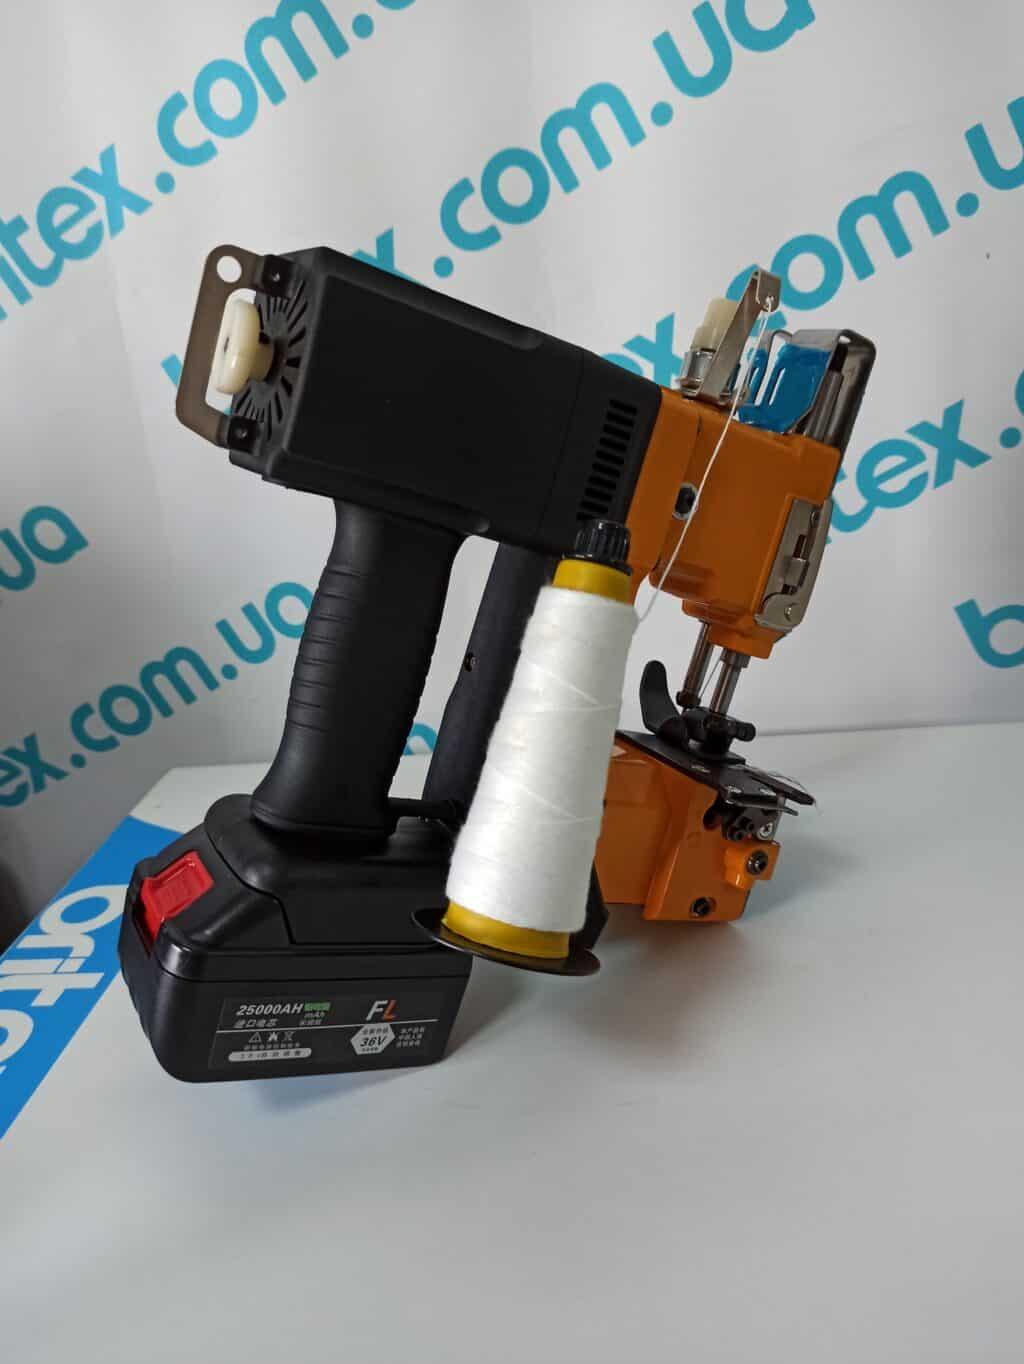 Мешкозашивочная машина GK9-900D на аккумуляторе